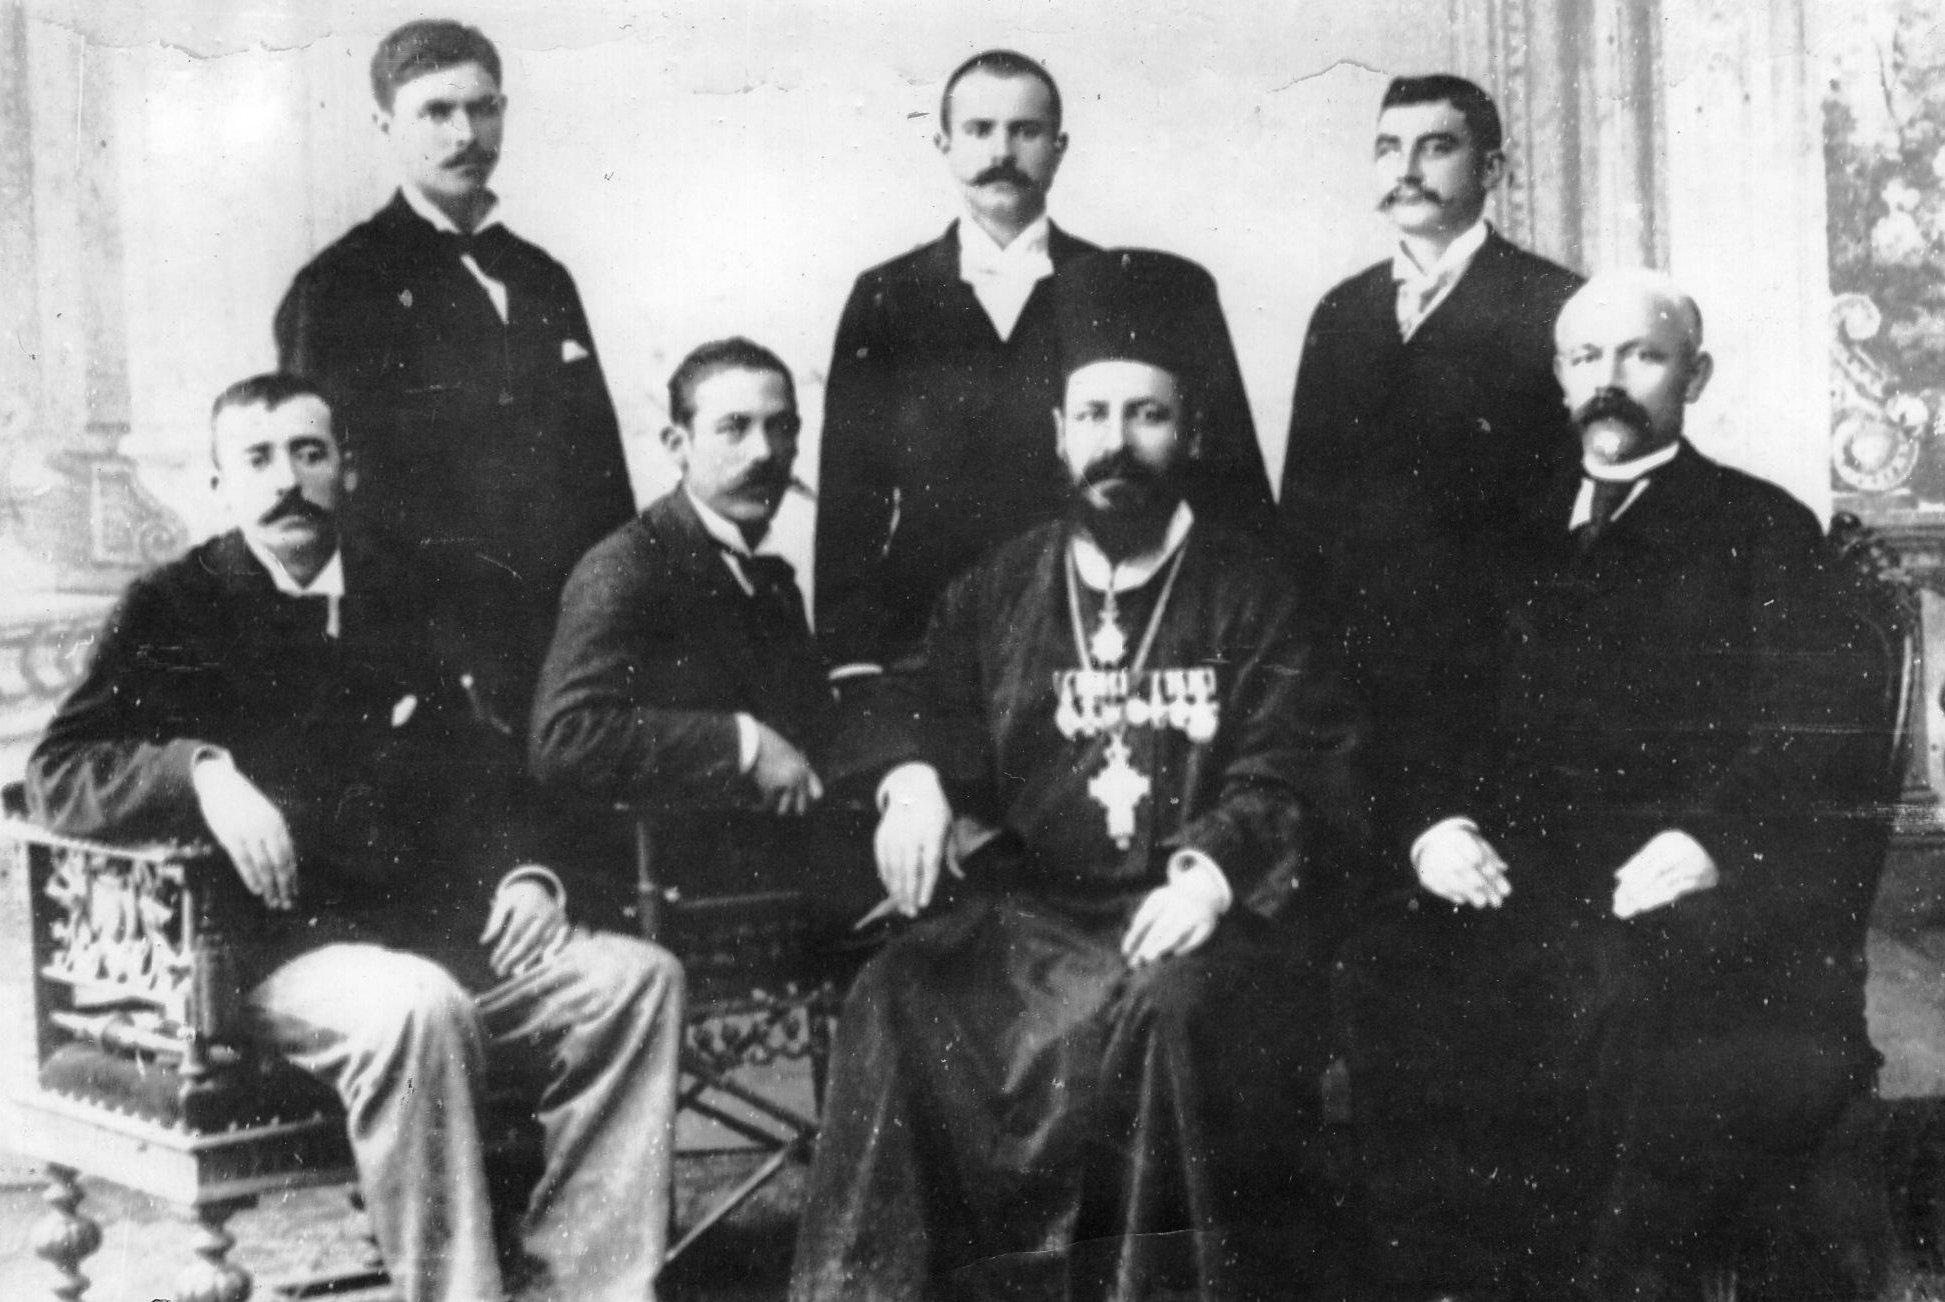 File Delegati od Skopska eparhija Wikimedia mons